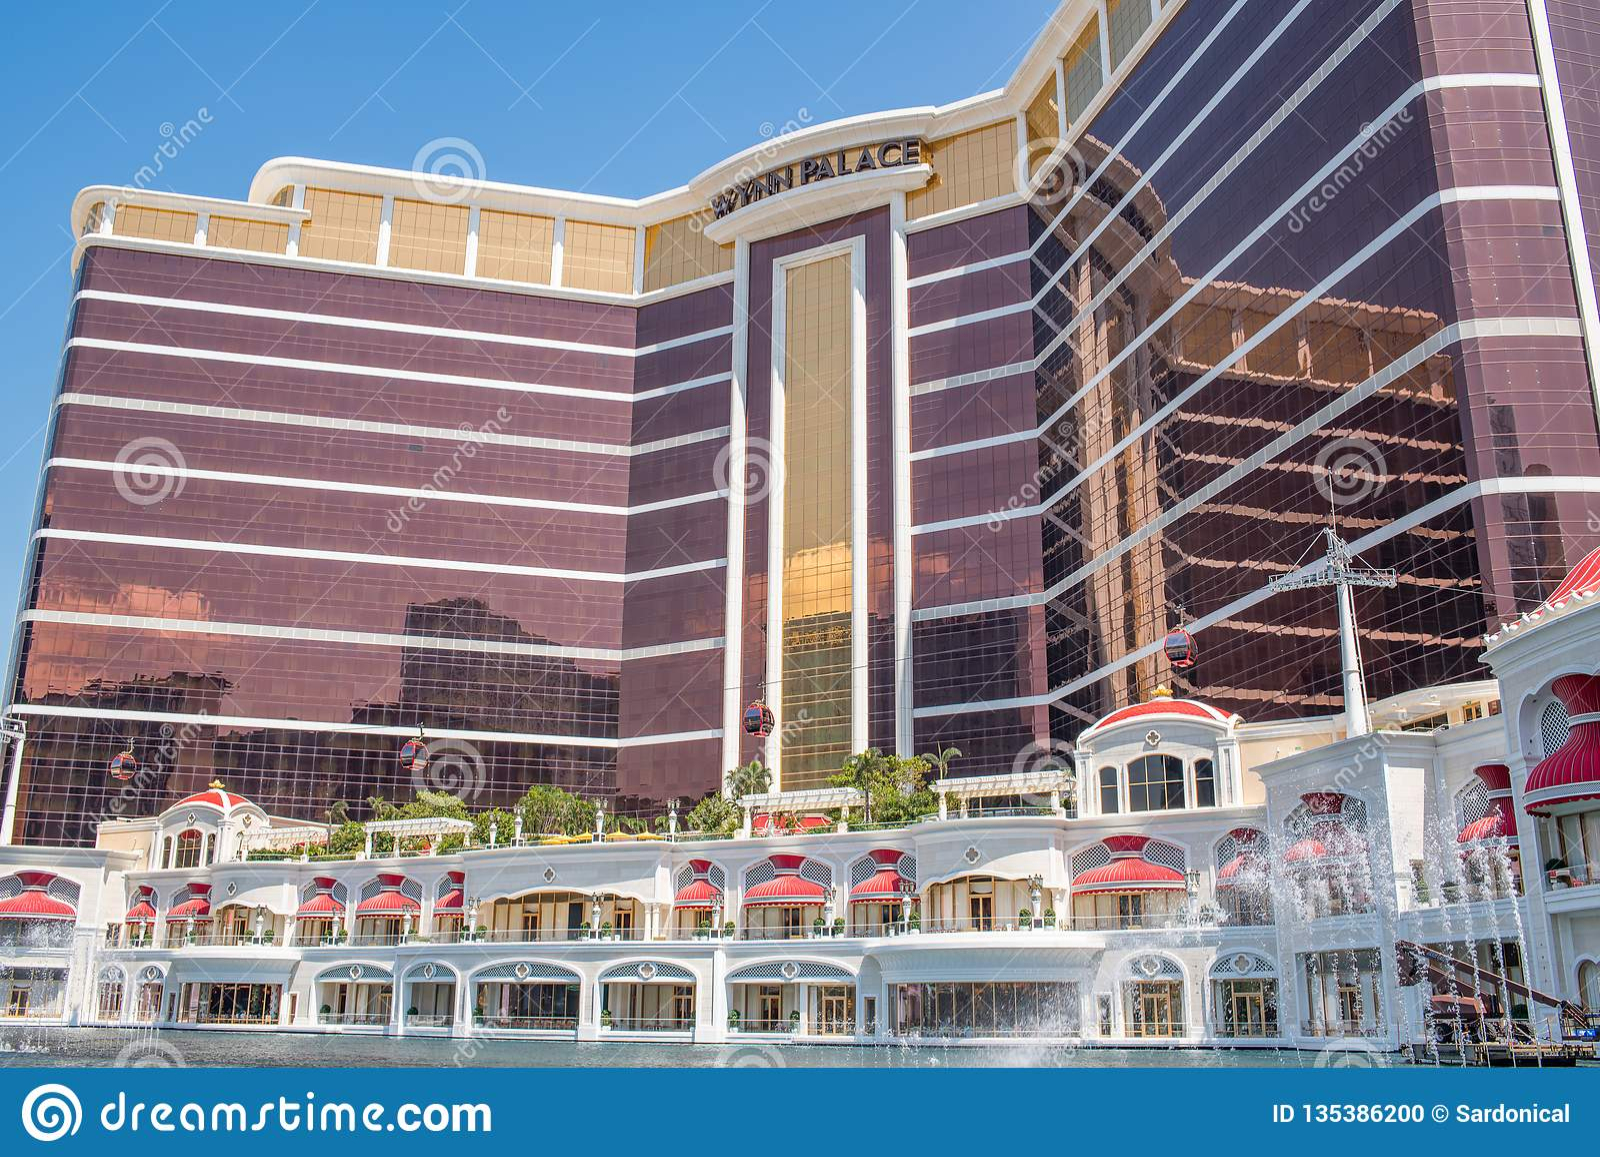 Wynn Palace In Cotai. Macau Editorial Image - Image of famous. 2018: 135386200